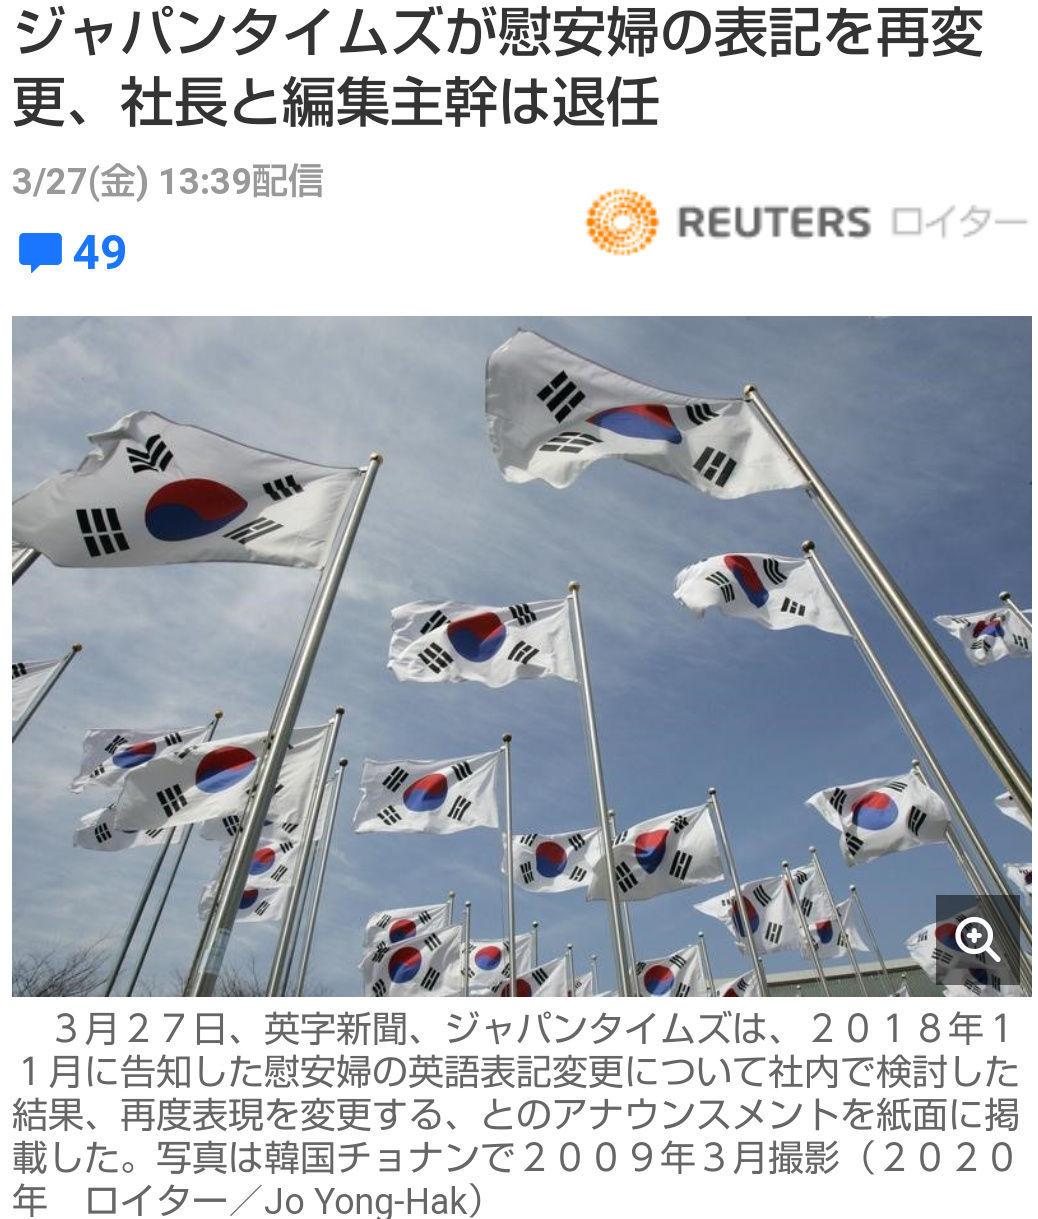 ZMPとZMP関連銘柄を語る ⬆共同通信、韓国紙、NHKに続け! >朝日、ニューヨークタイムズに続け! 【ジャパンタイムズが慰安婦